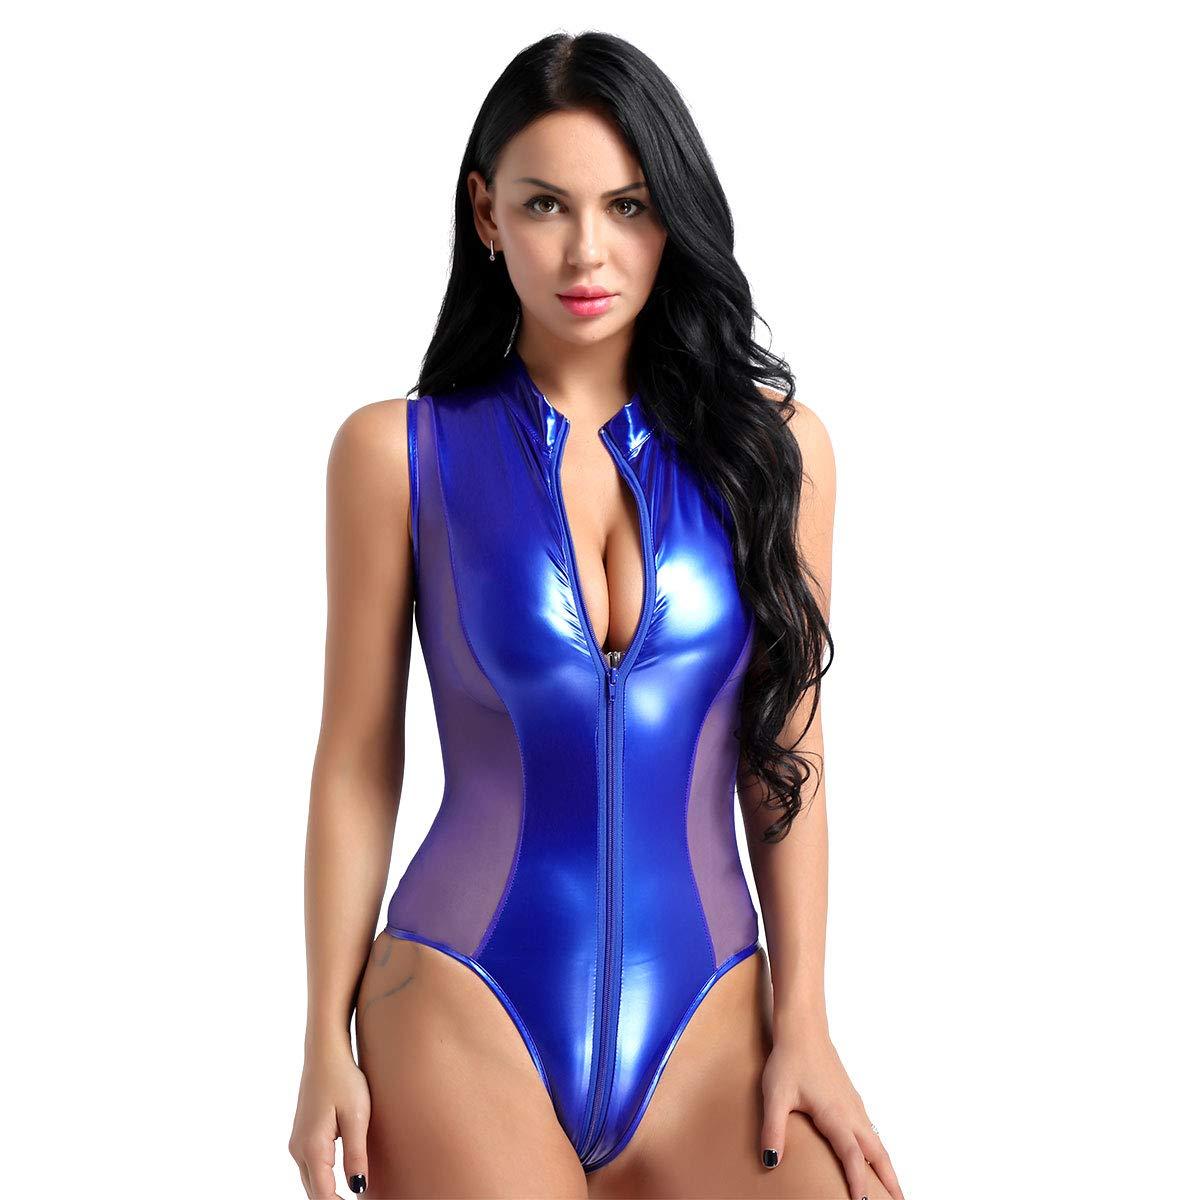 iixpin Womens One Piece Shiny Metallic Patent Leather Halter Neck Sleeveless Thong Leotard Bodysuit Nightwear